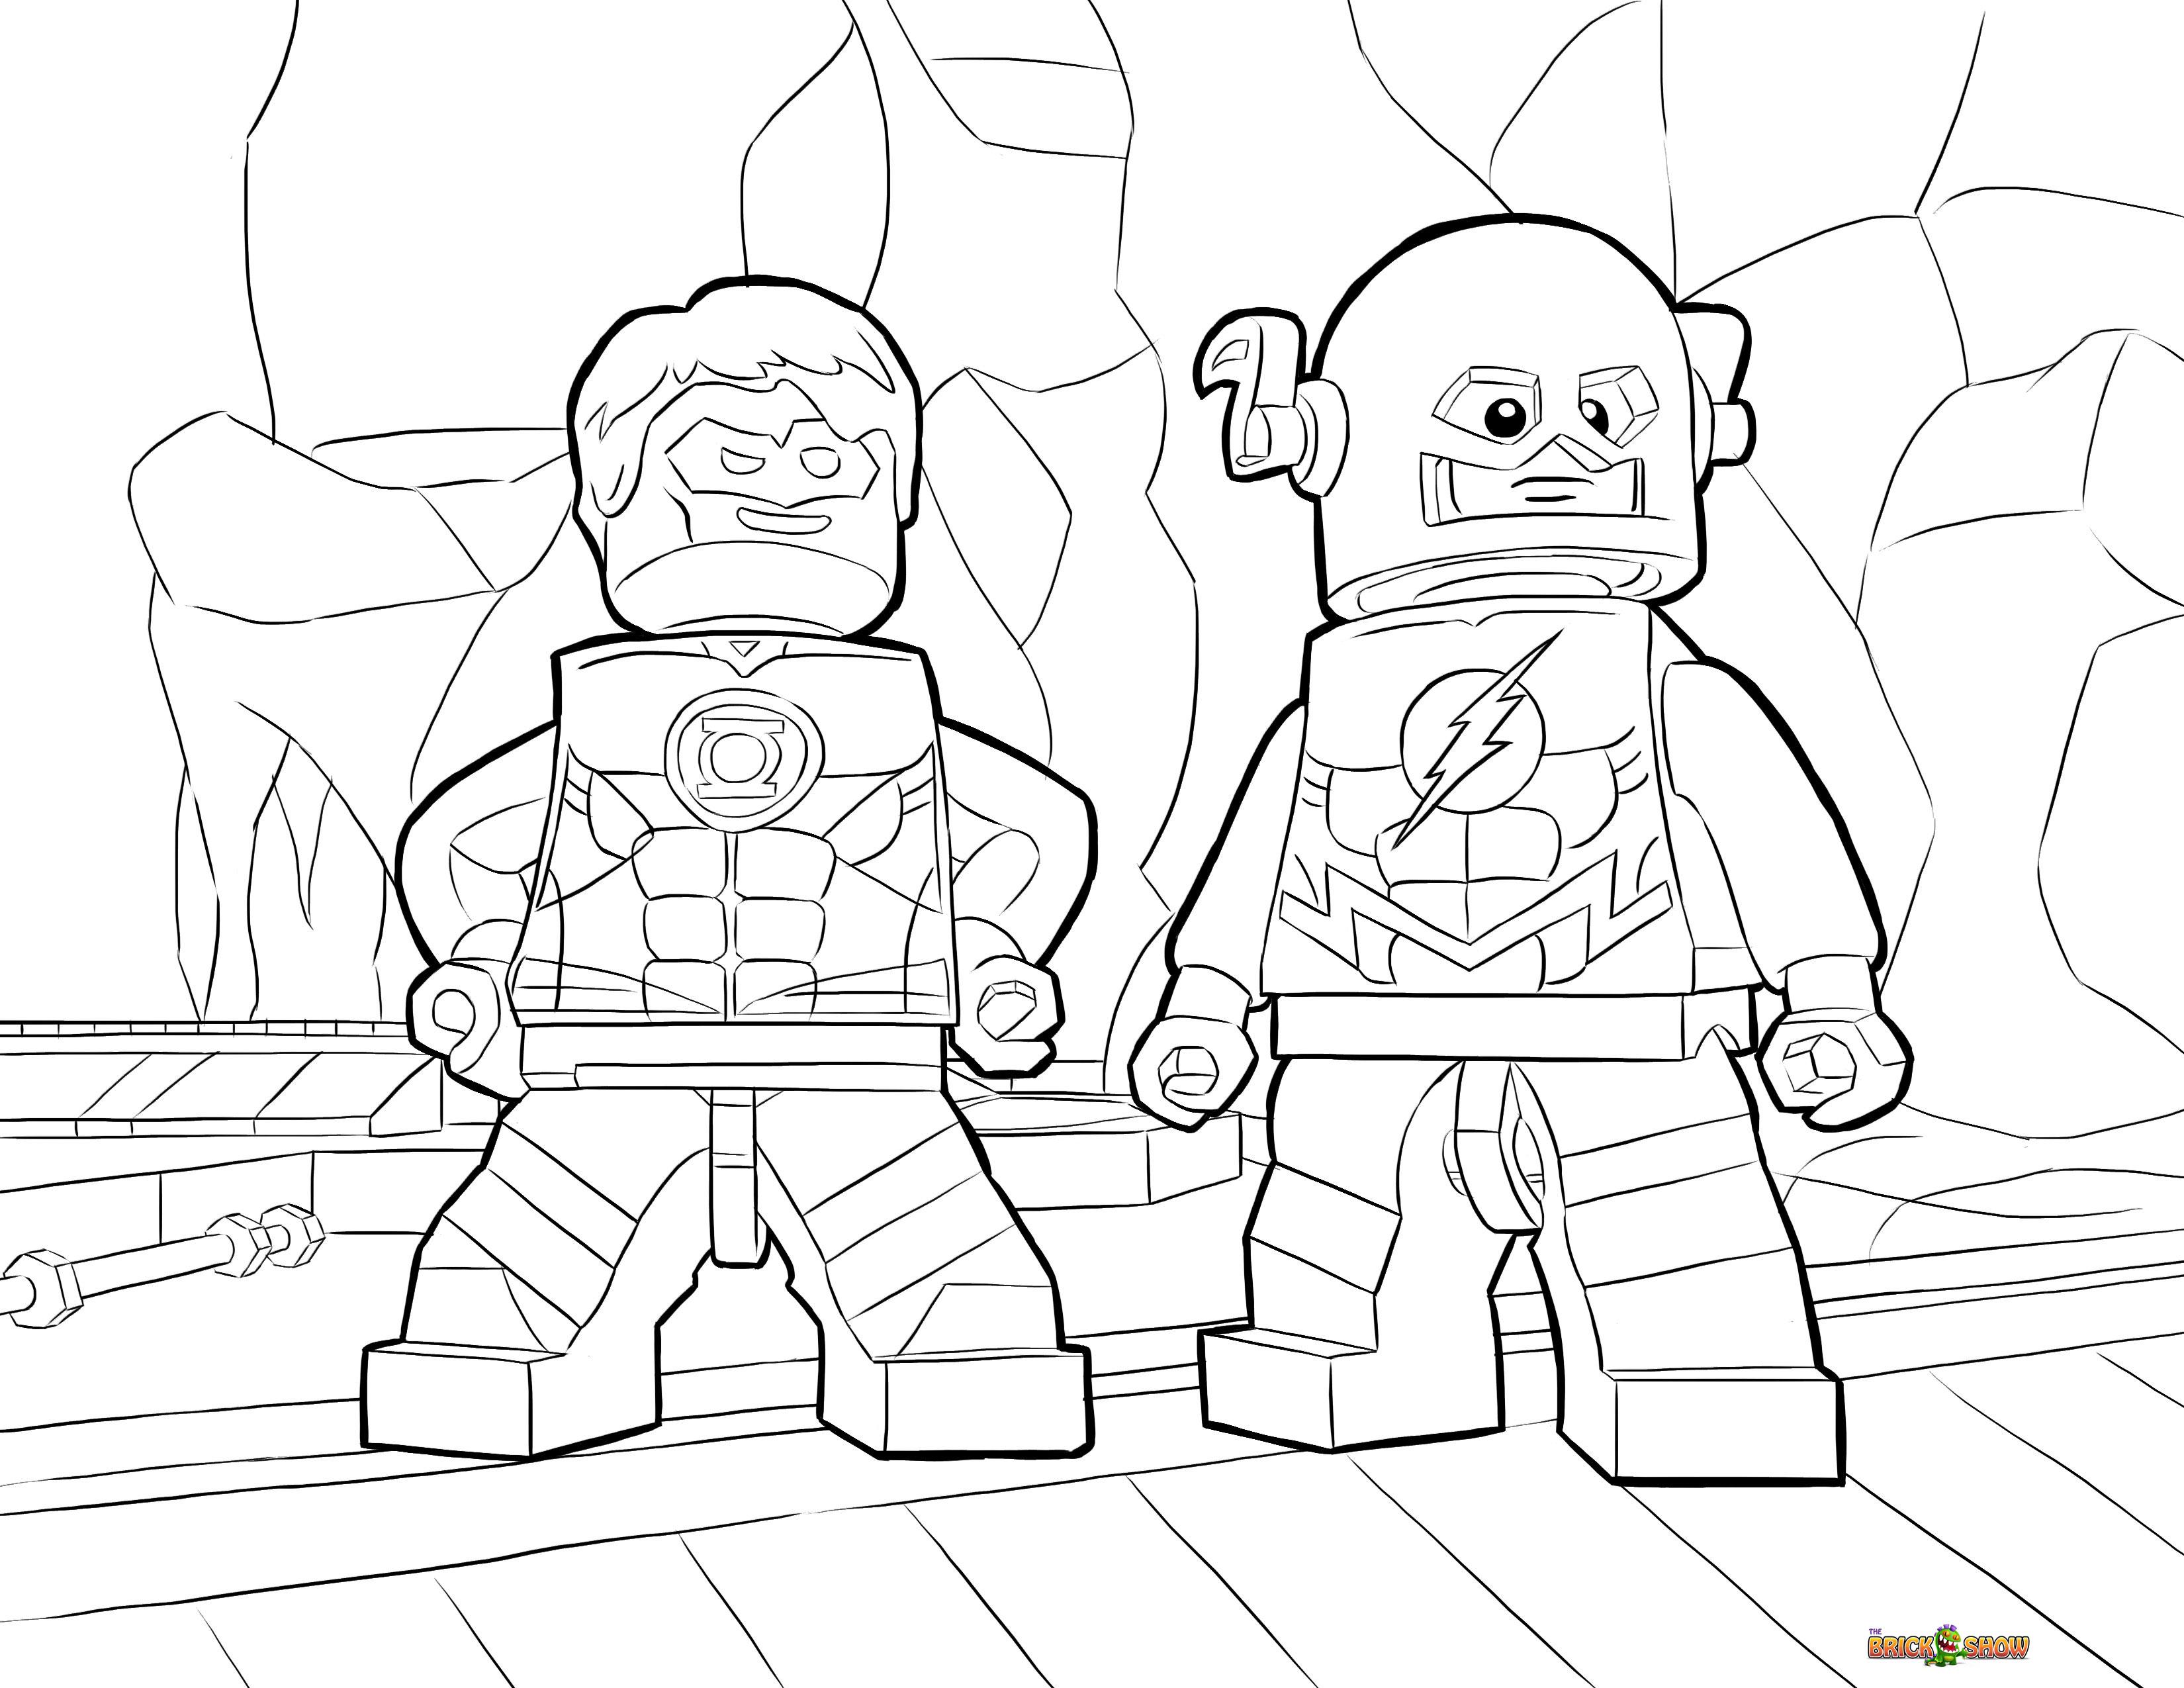 3300x2550 Lego Flash And Green Lantern Coloring Page, Printable Sheet